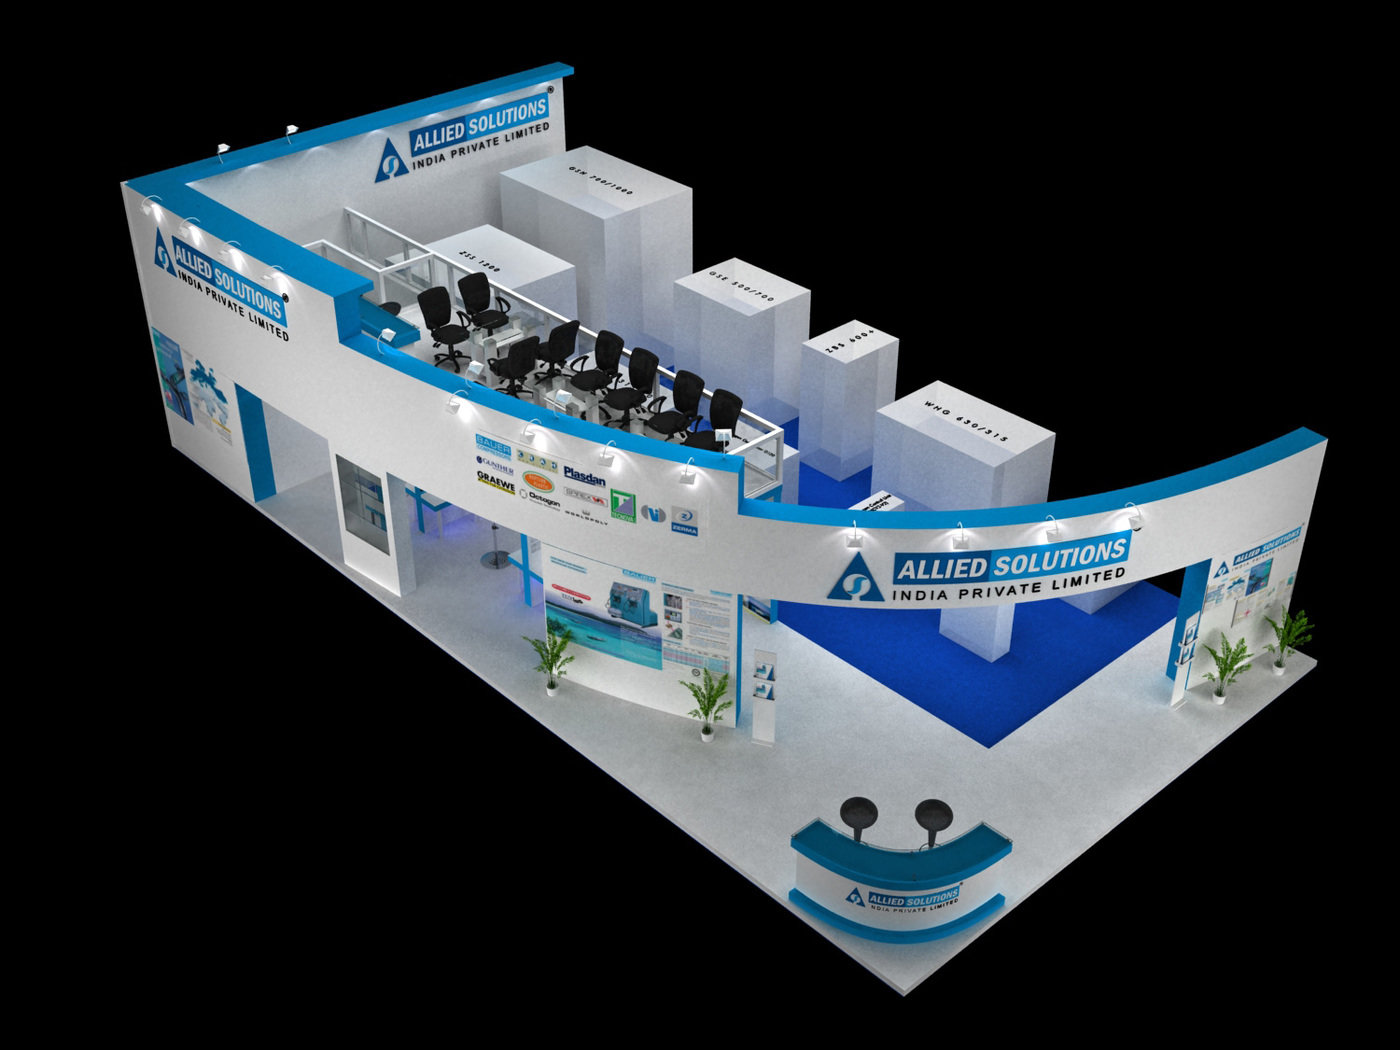 Exhibition Stall Design Coroflot : Exhibition stall designs by dnyansagar sapkale at coroflot